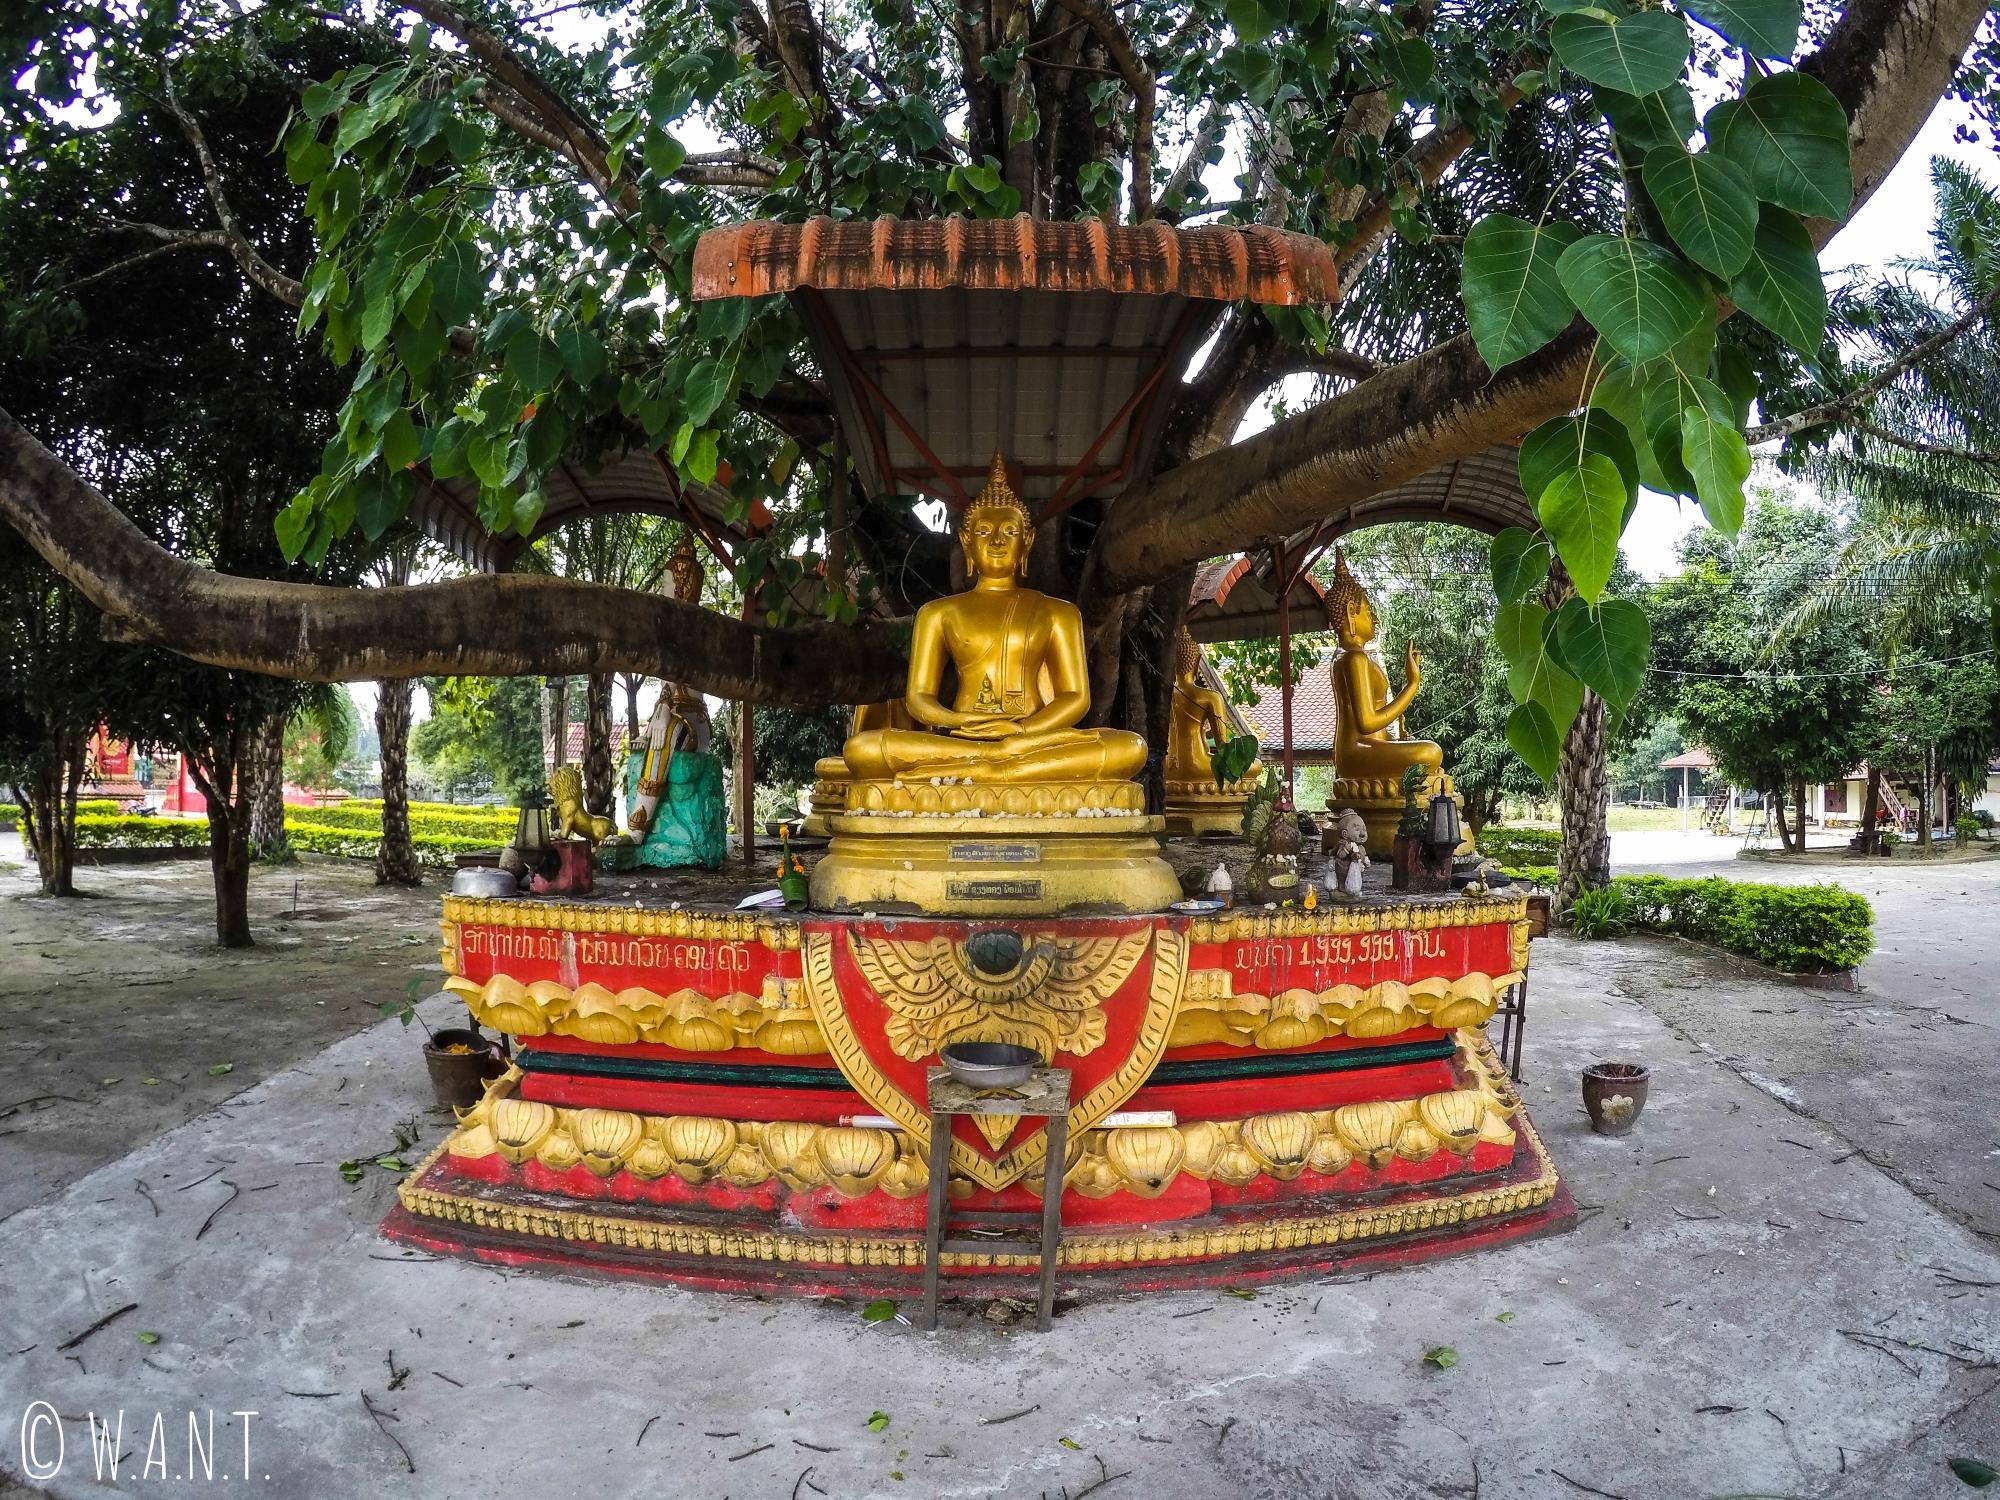 Statues de Bouddha au temple de Lak Sao